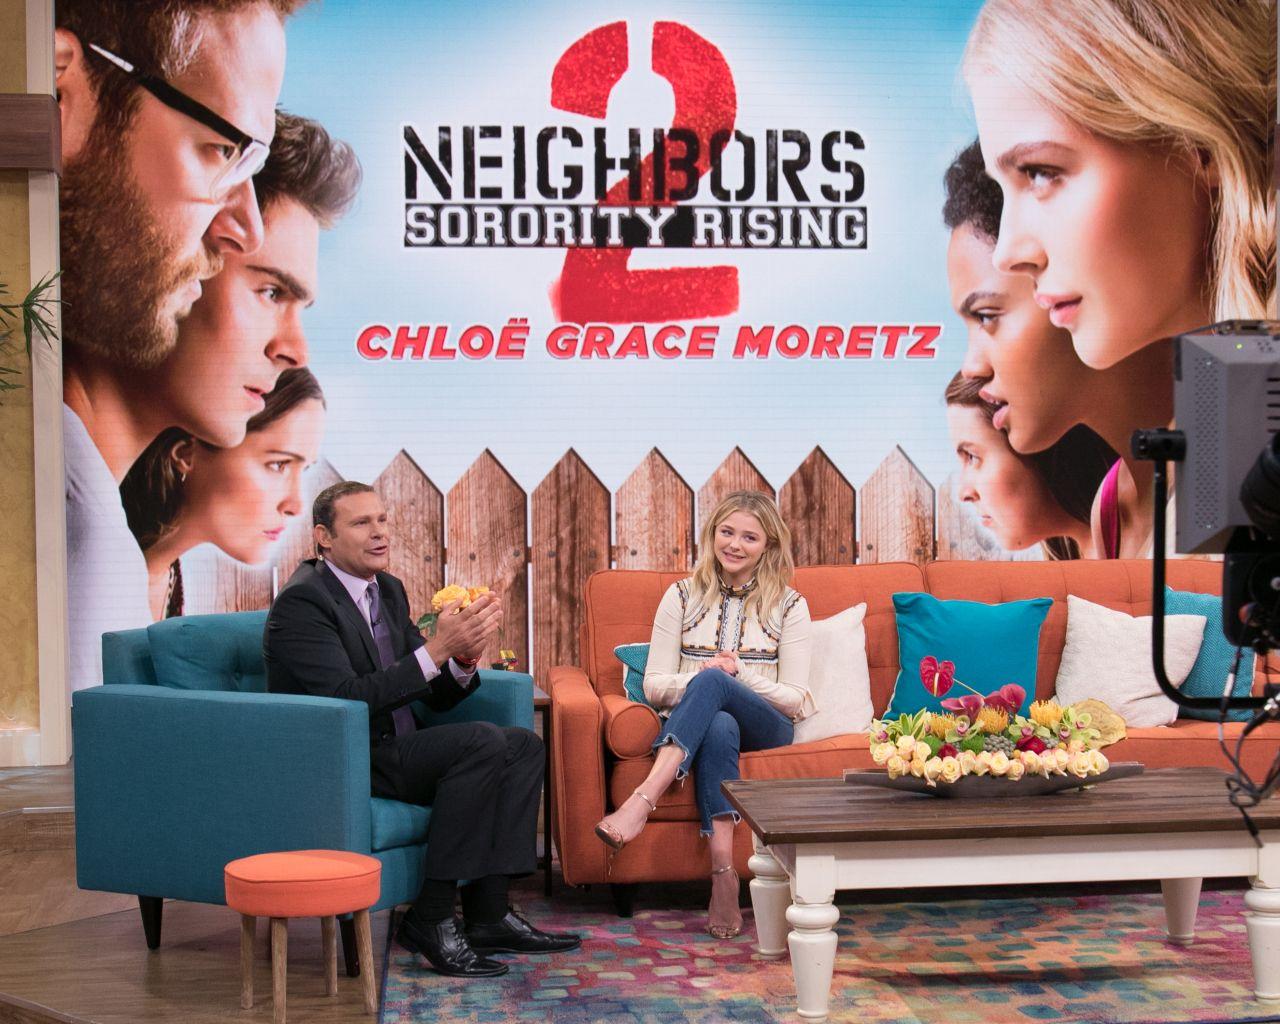 Chloe Moretz Neighbors 2 Sorority Rising Wallpapers: Promoting 'Neighbors 2: Sorority